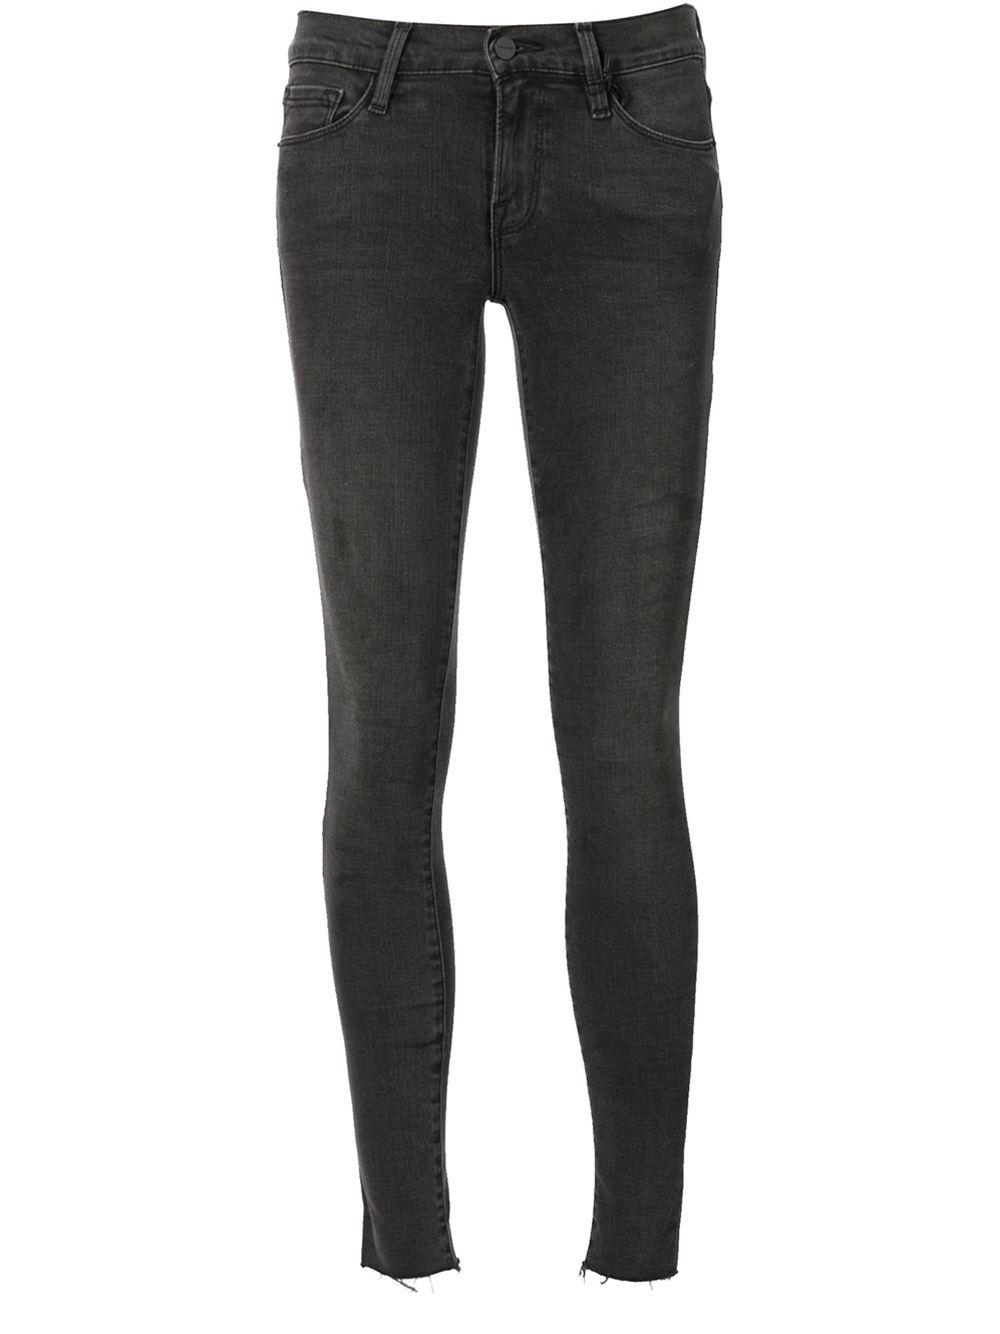 Frame Denim Le Skinny De Jeanne Fray Jeans In Black Lyst